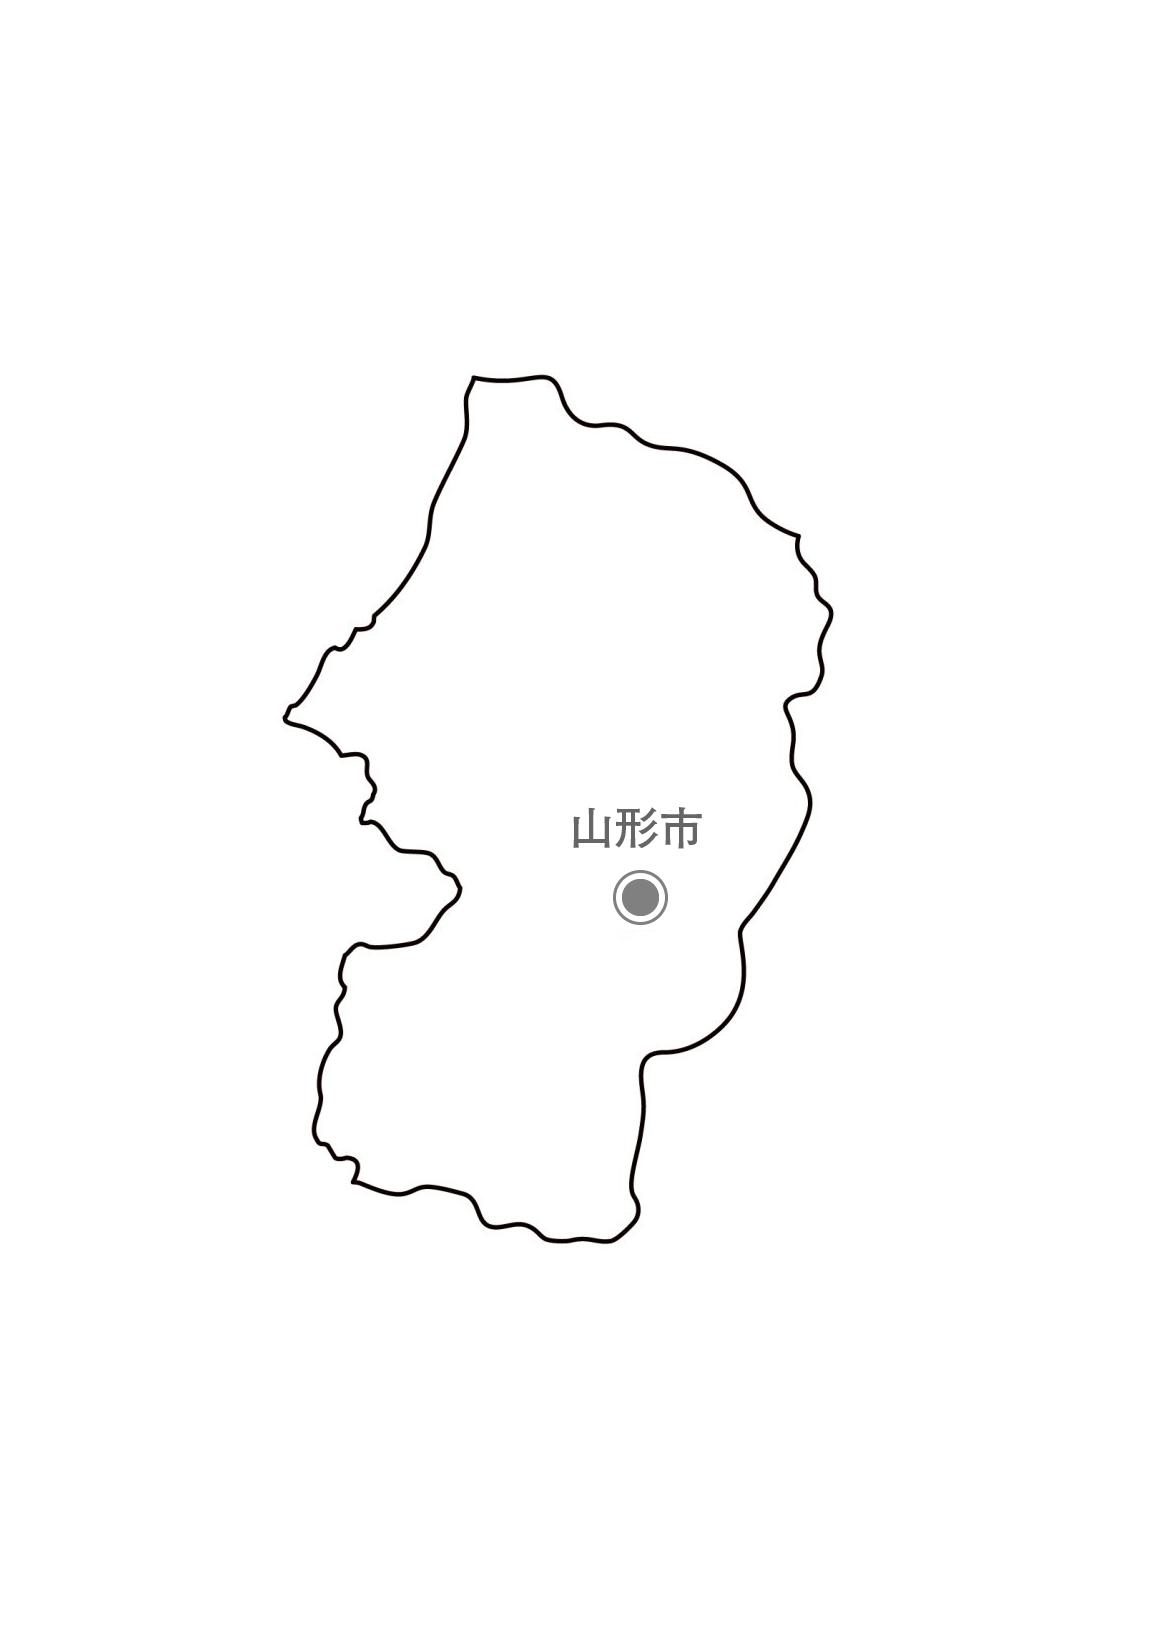 [白地図]山形県・都道府県名・県庁所在地あり